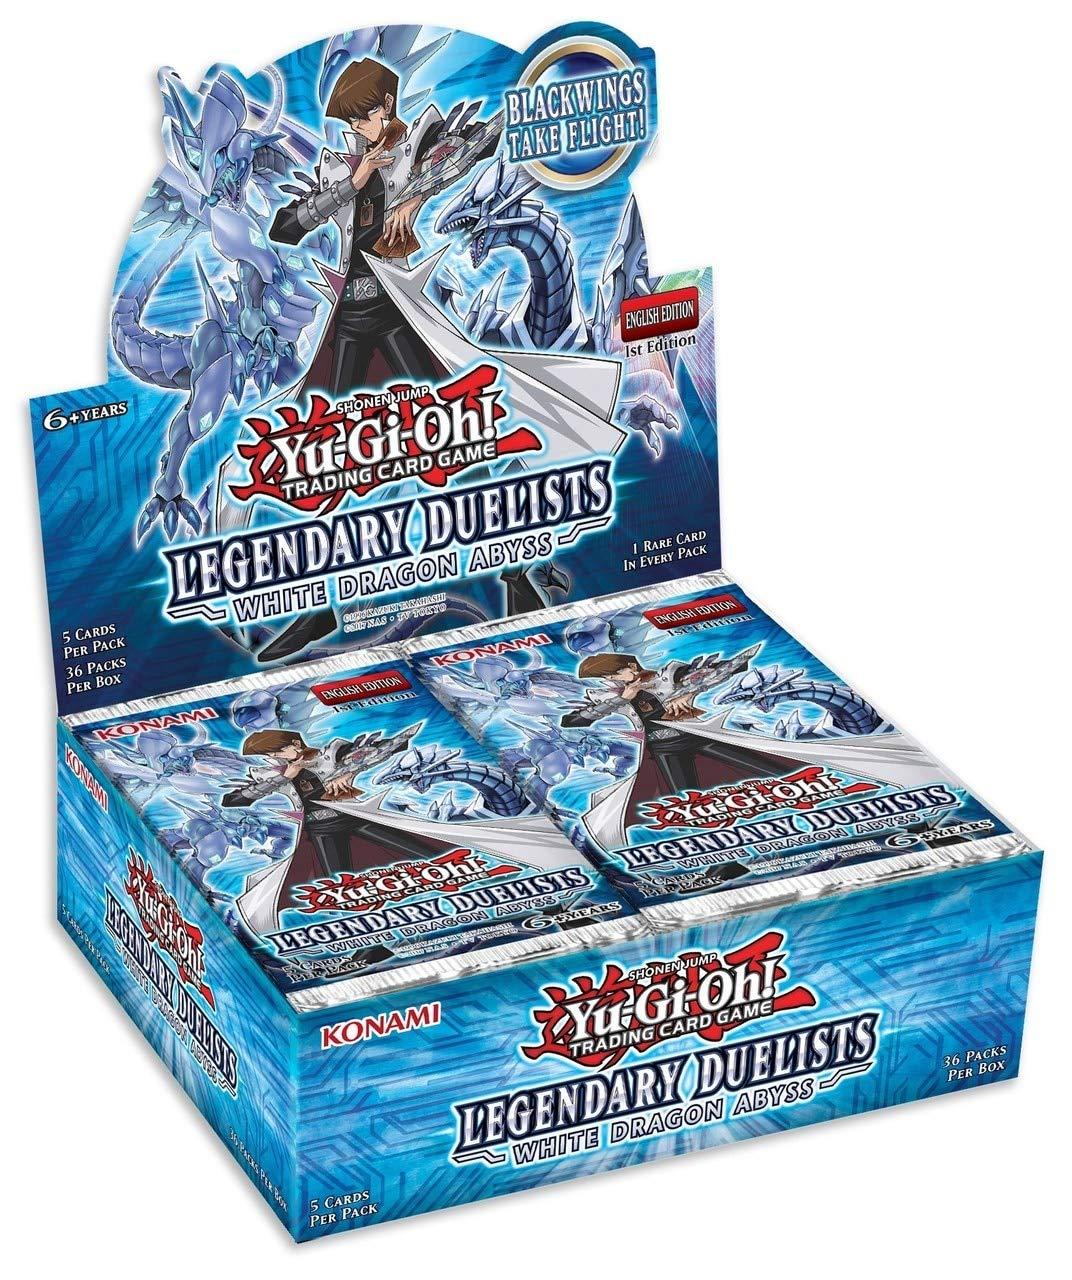 YU-GI-OH! Legendary Duelists: White Dragon Abyss Booster Box Konami